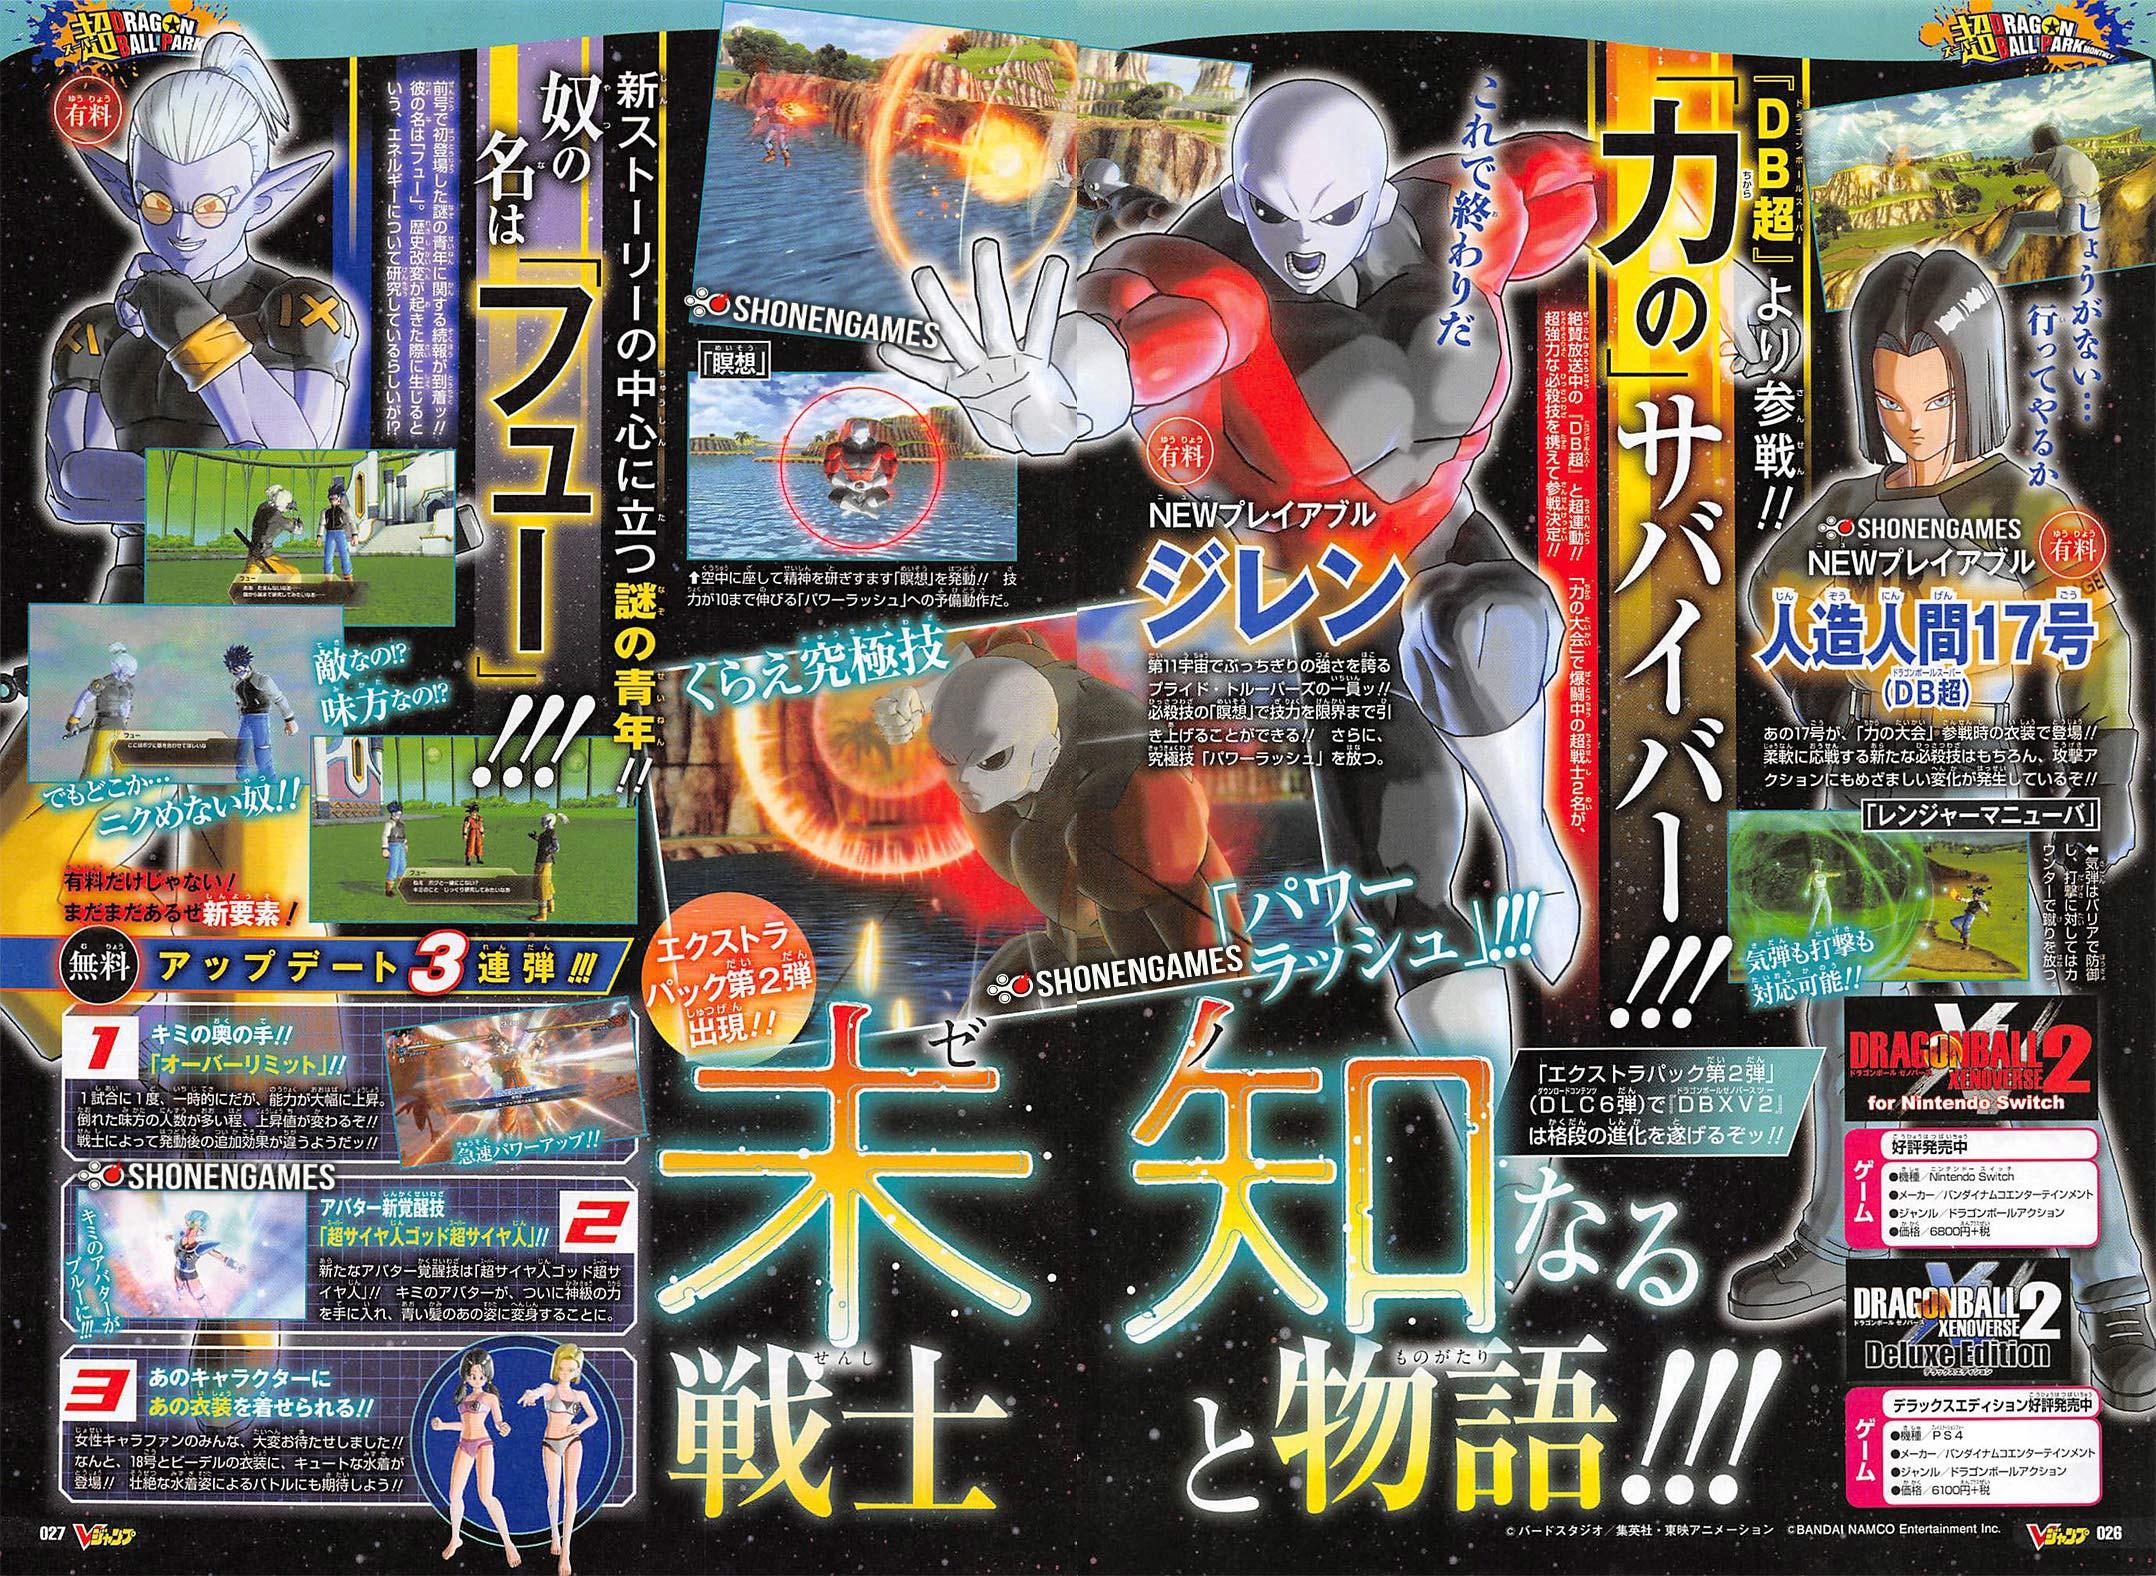 Dragon Ball XenoVerse 2: due nuovi guerrieri da Dragon Ball Super